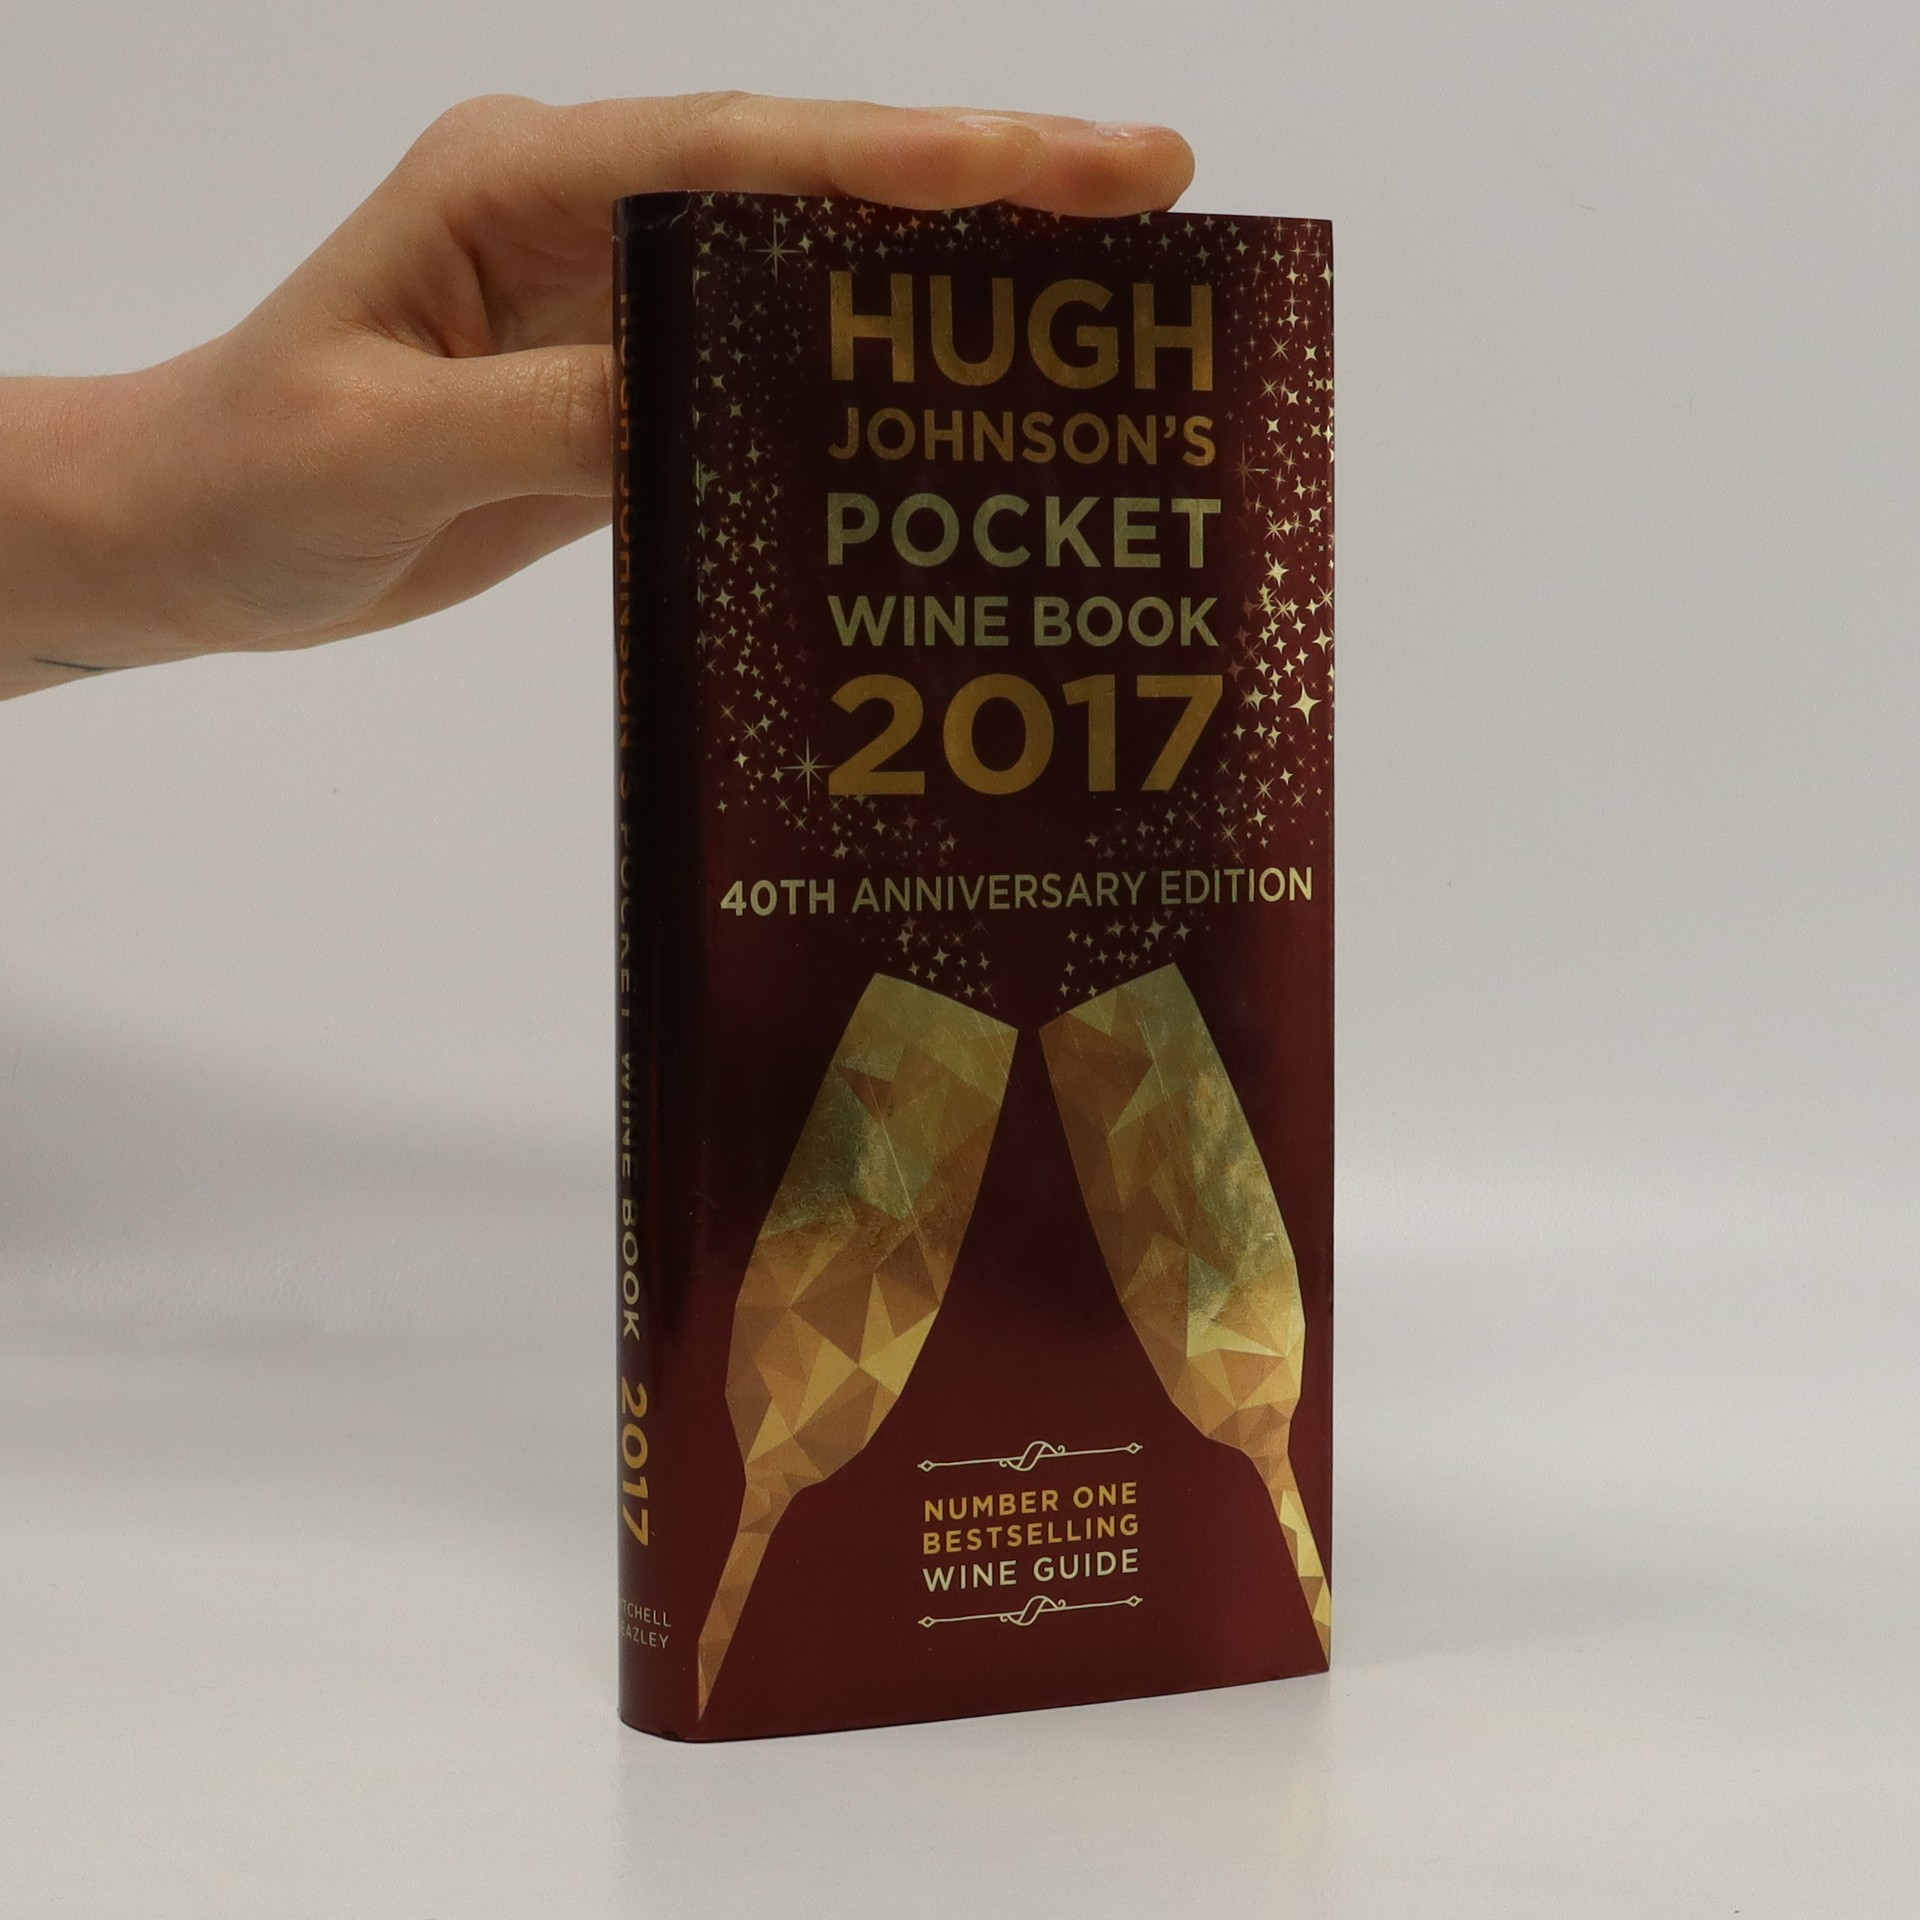 antikvární kniha Hugh Johnson's pocket wine book 2017, 2016